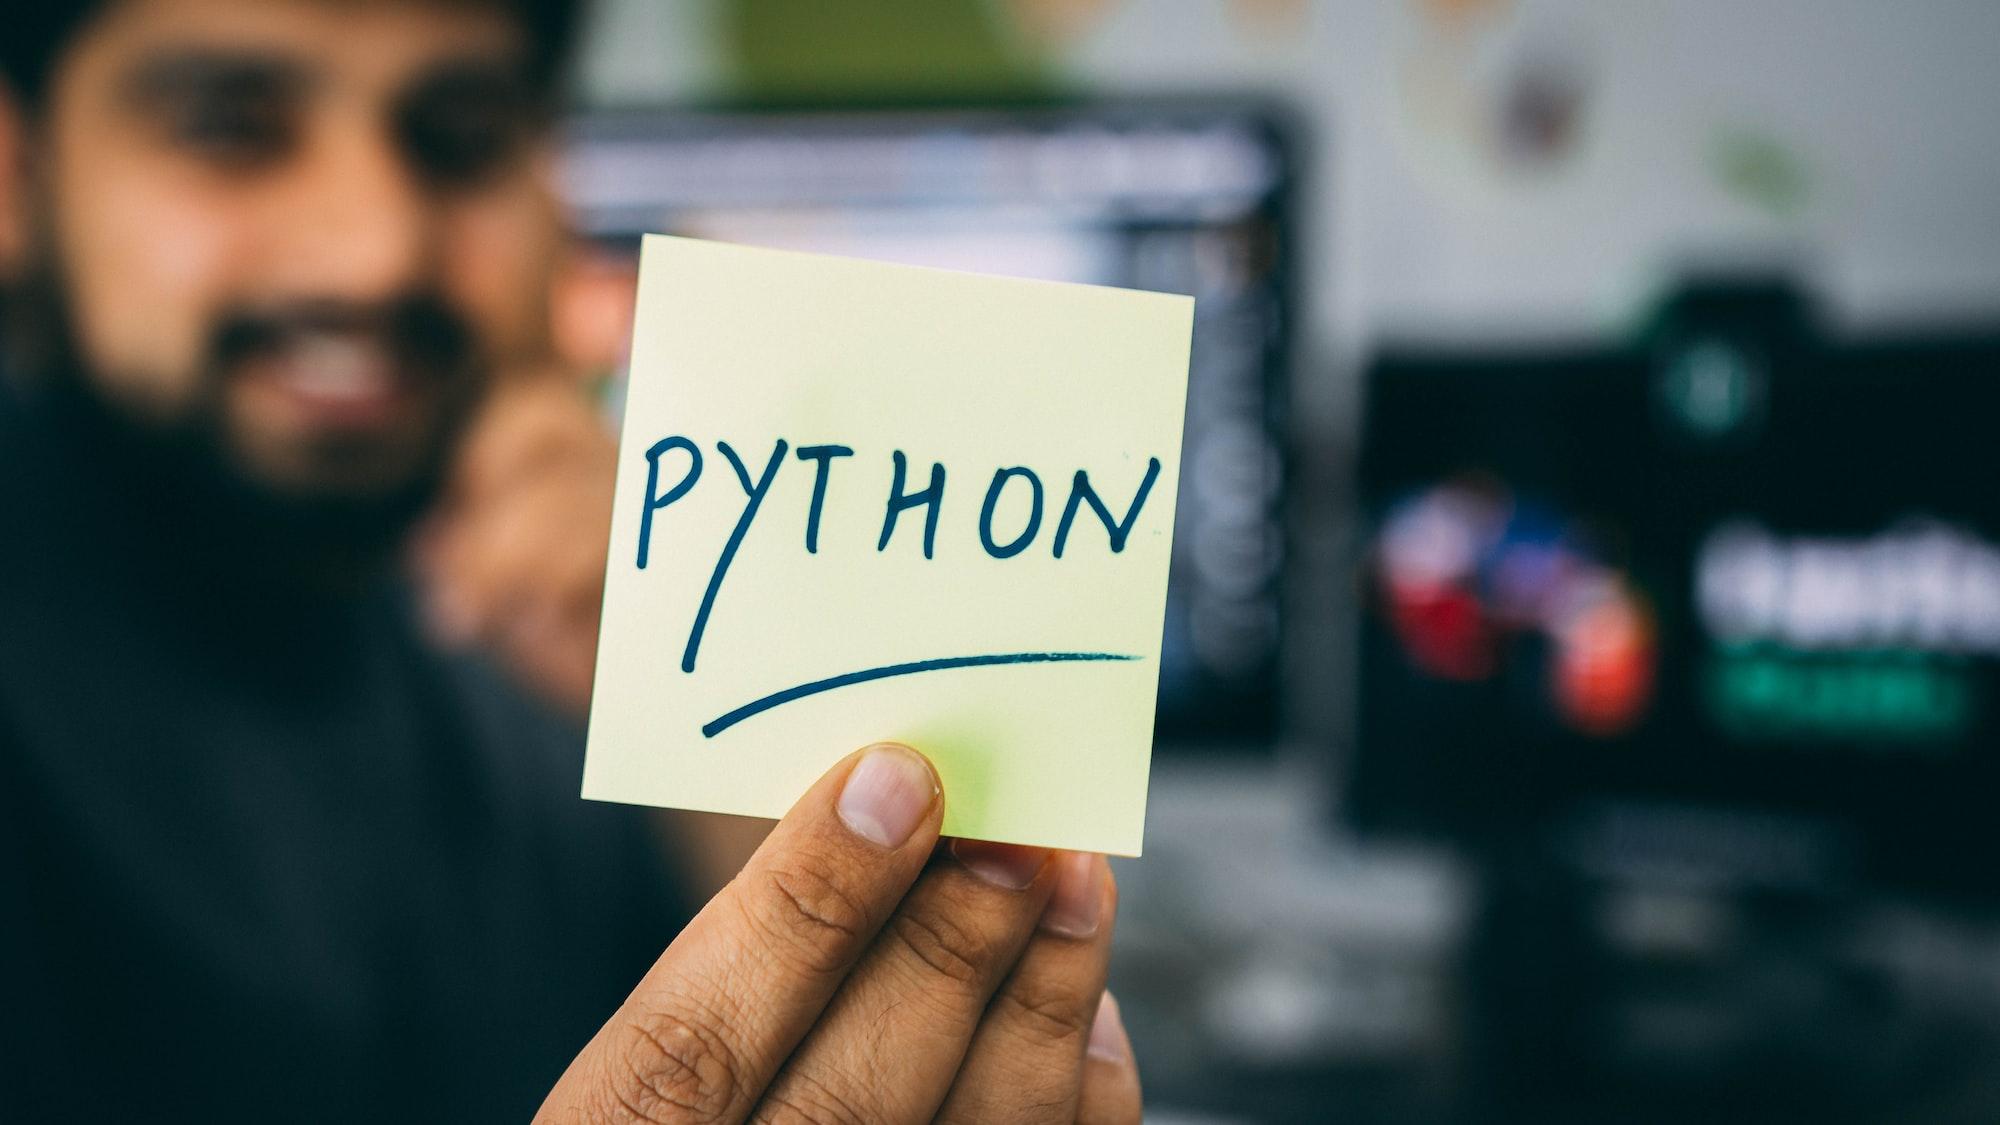 Every Python Tuple Method Explained Simply (plus bonustidbits)